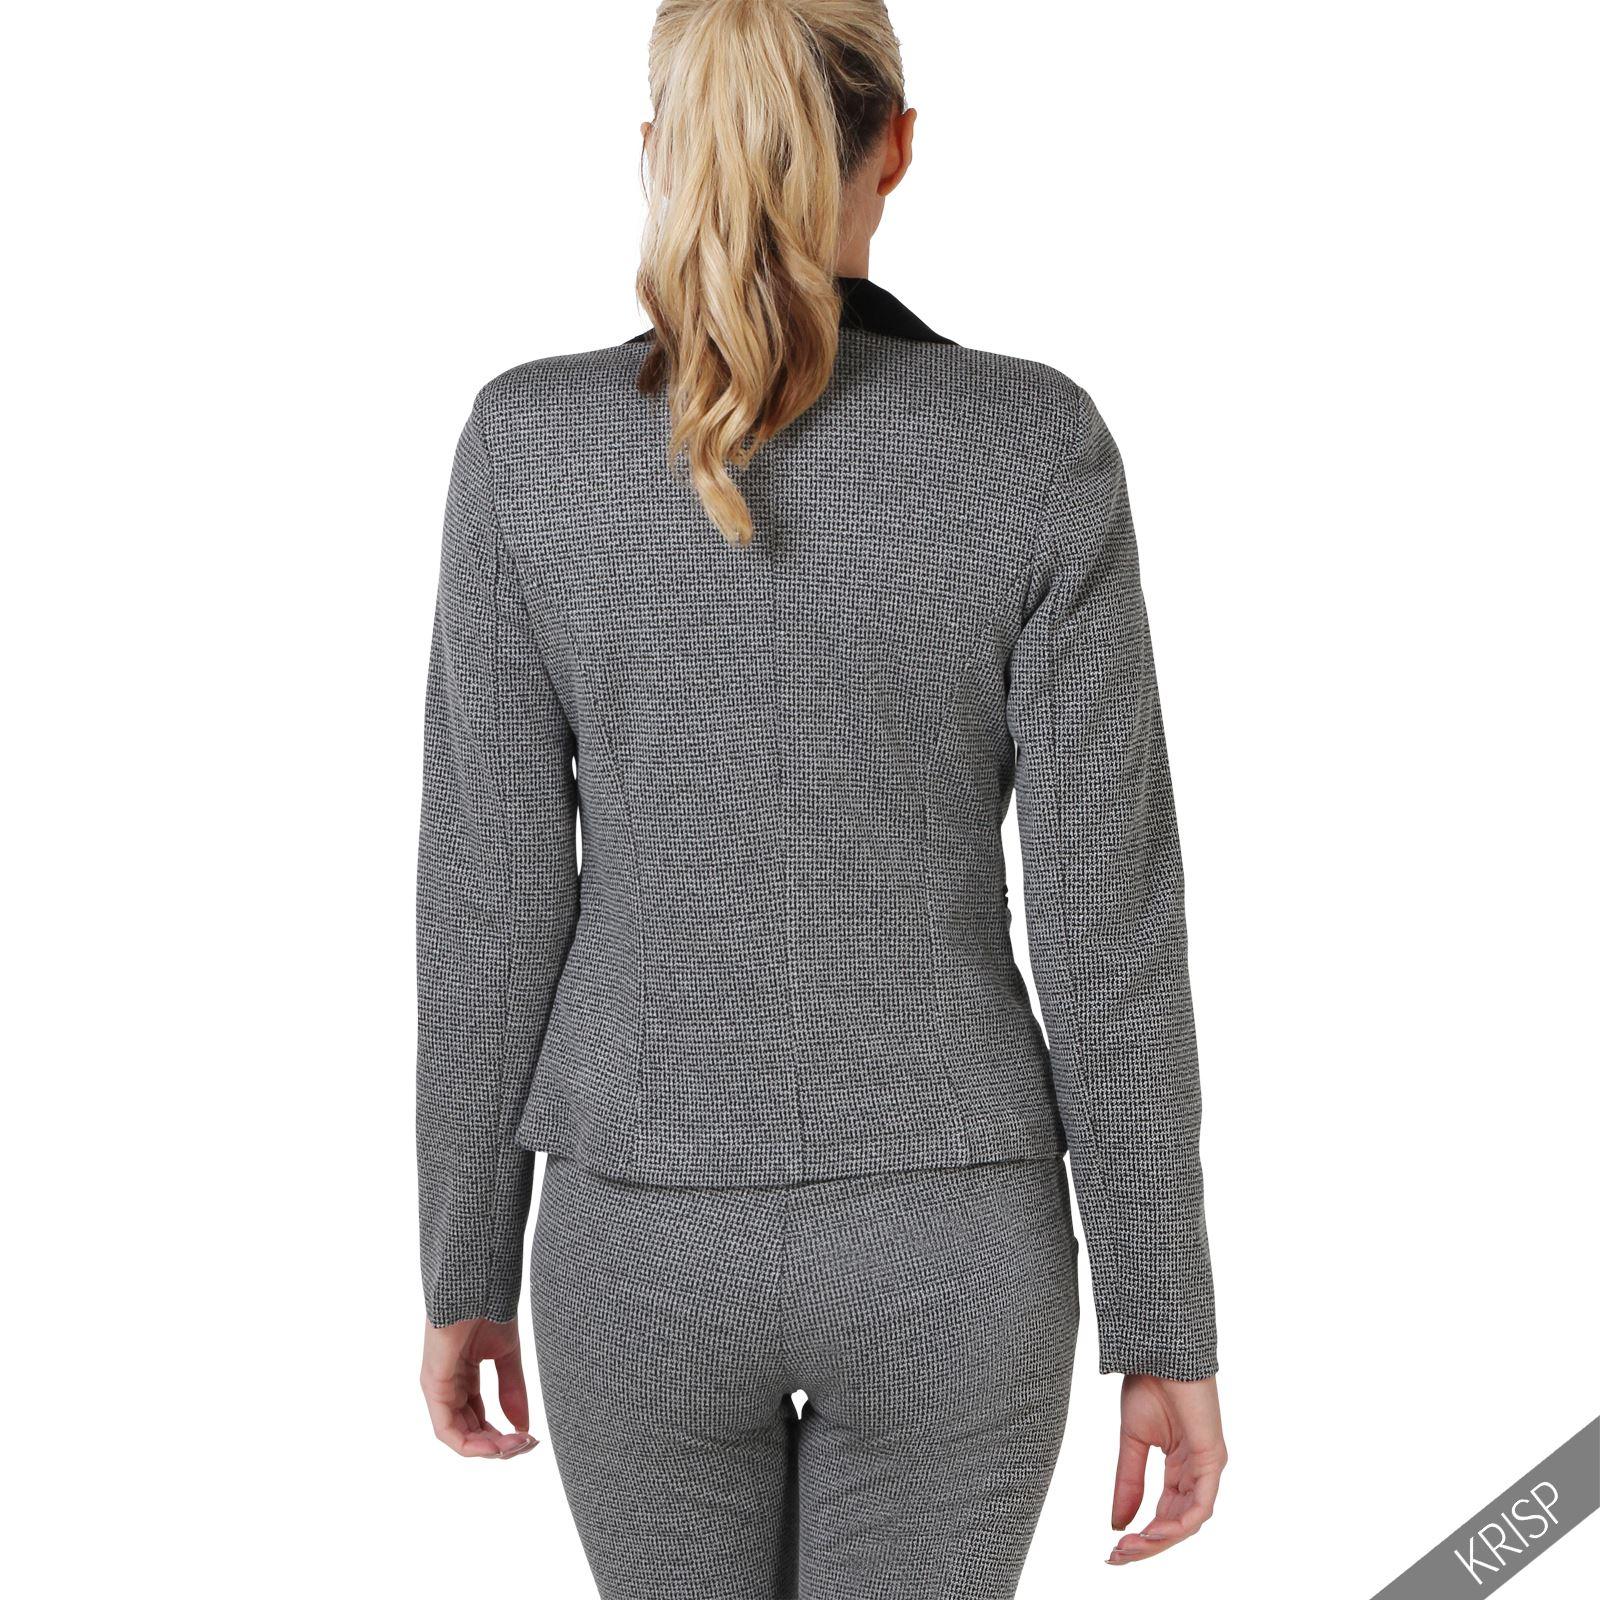 femmes ensemble veste blazer pantalon cigarette pince. Black Bedroom Furniture Sets. Home Design Ideas